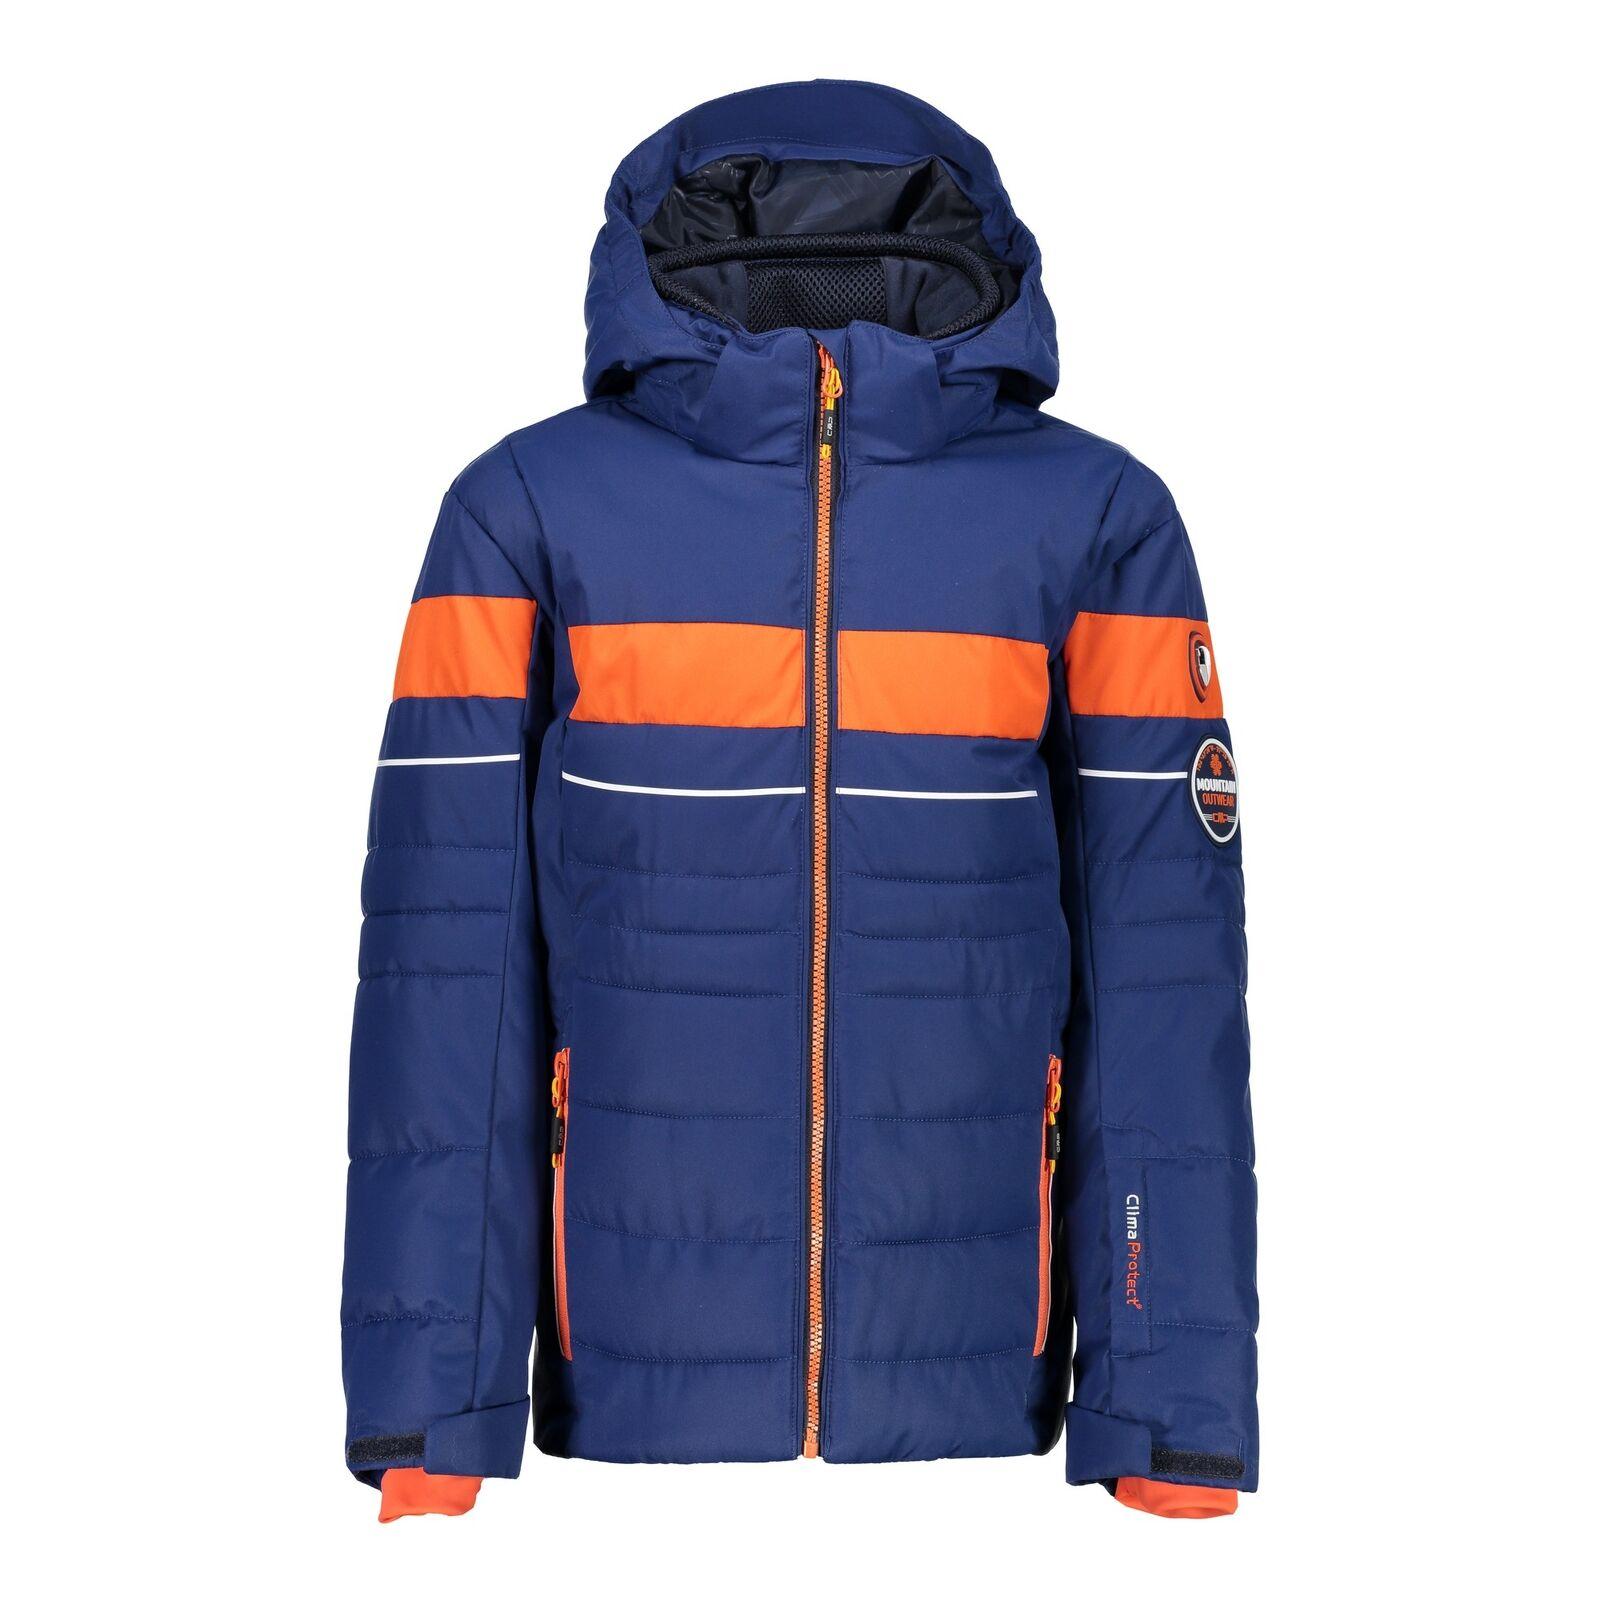 CMP Skijacke Snowboardjacke BOY JACKET SNAPS HOOD blau winddicht Twill